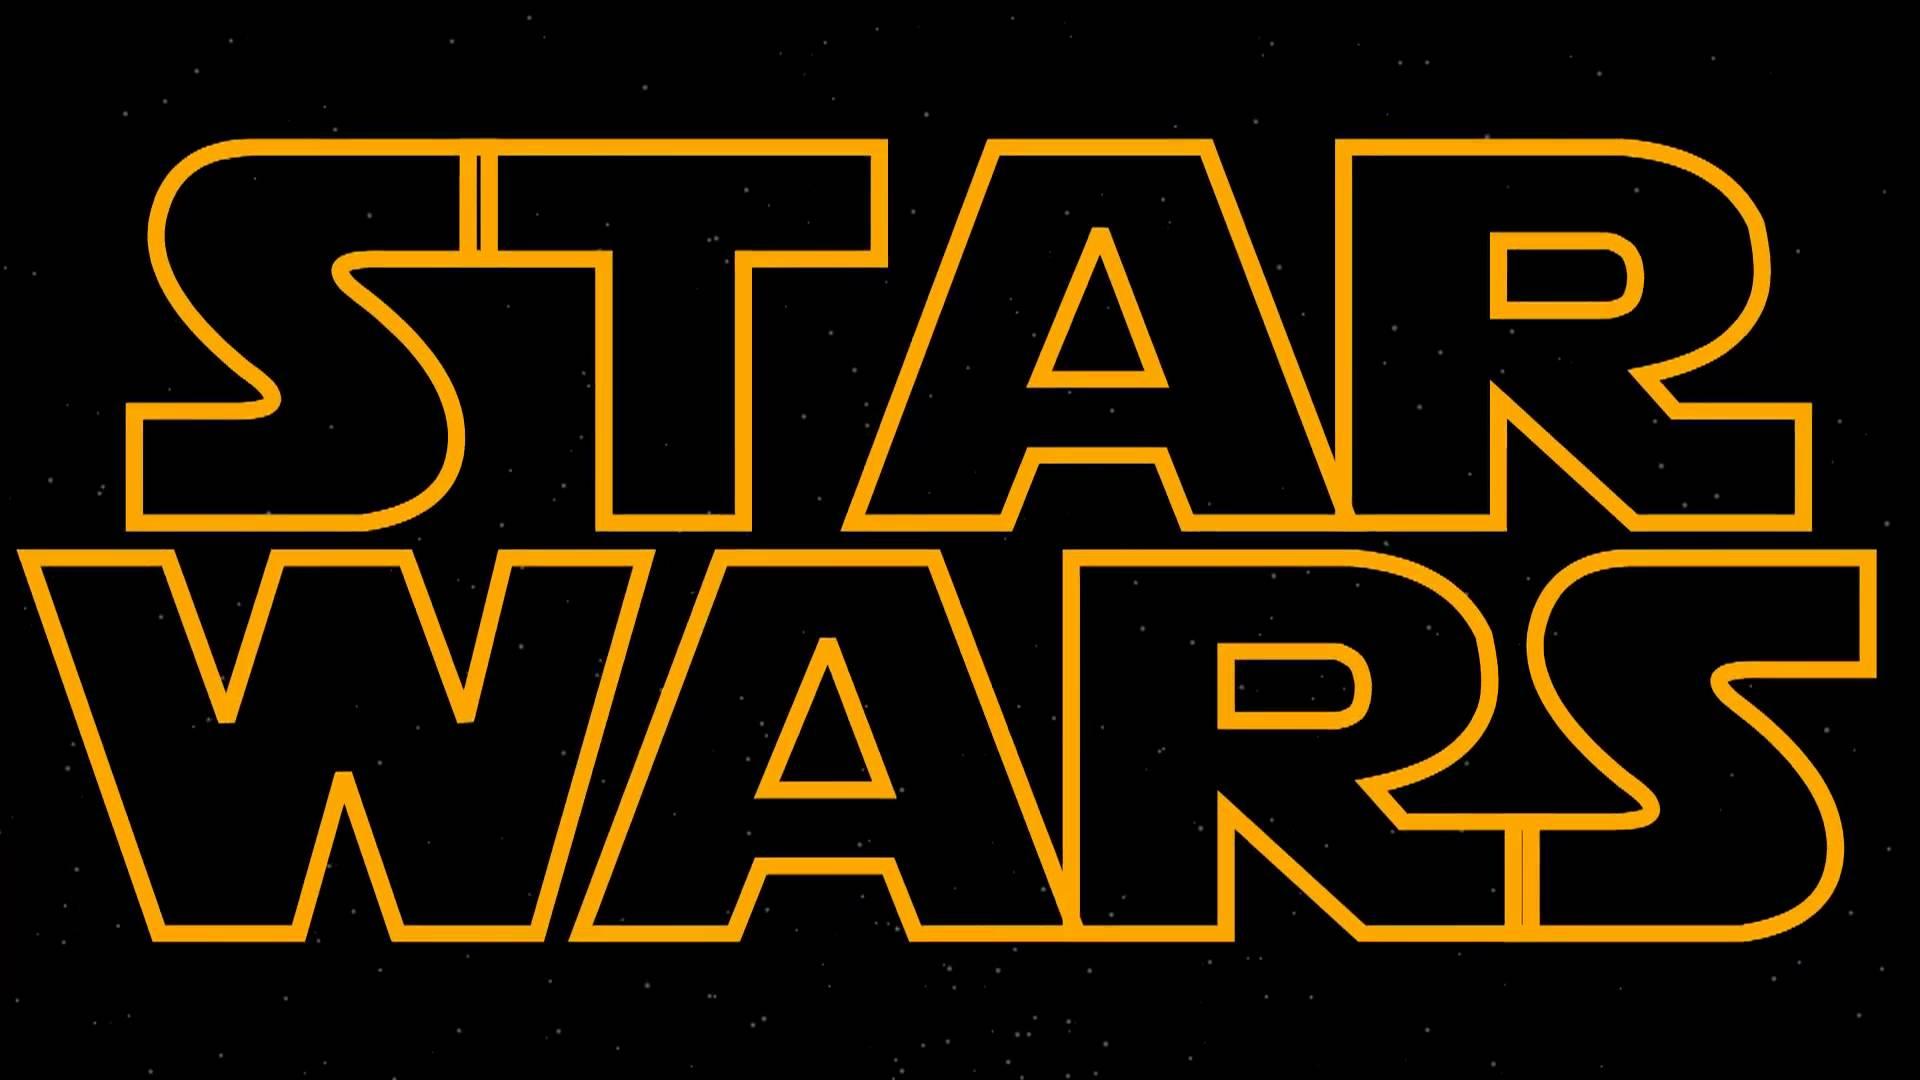 Объявлена дата выхода восьмого эпизода Star Wars